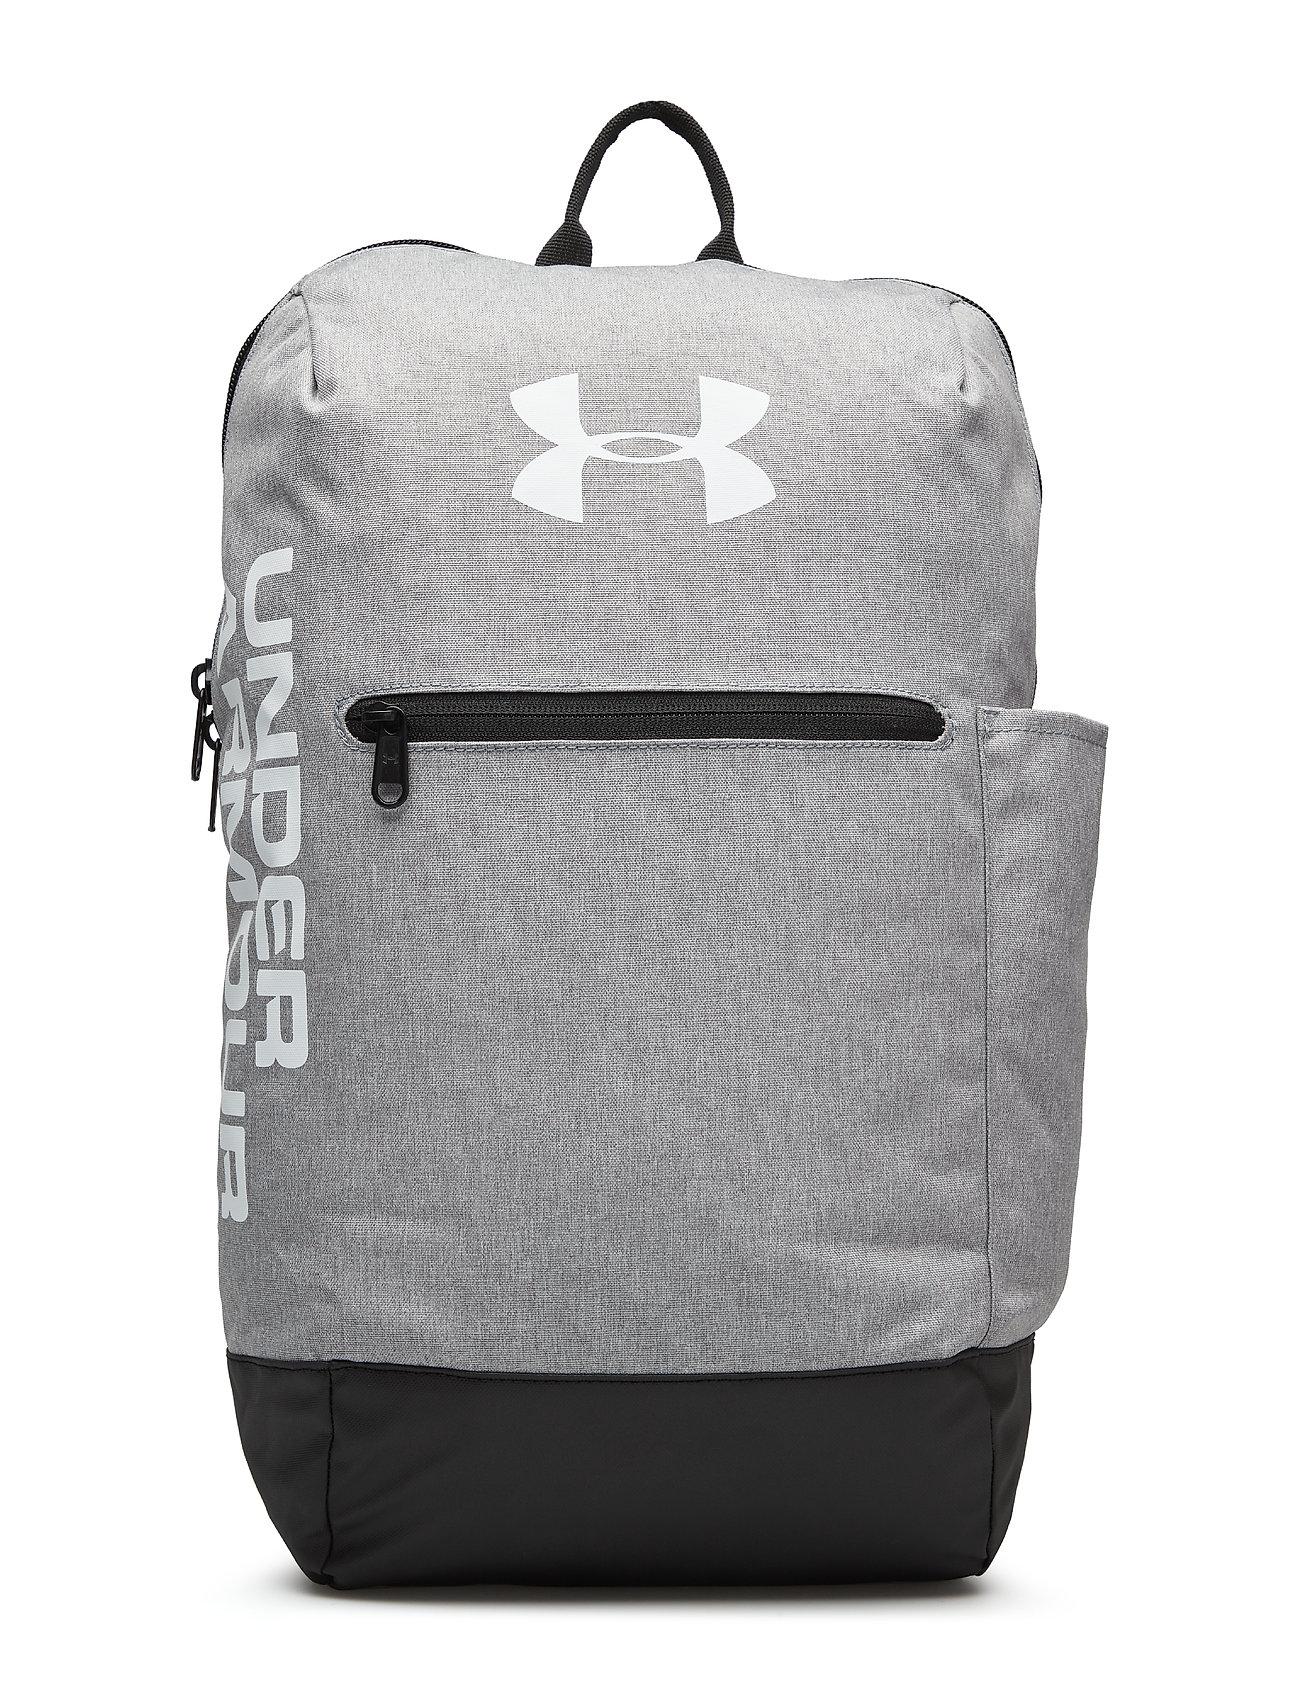 Under Armour UA Patterson Backpack - STEEL MEDIUM HEATHER